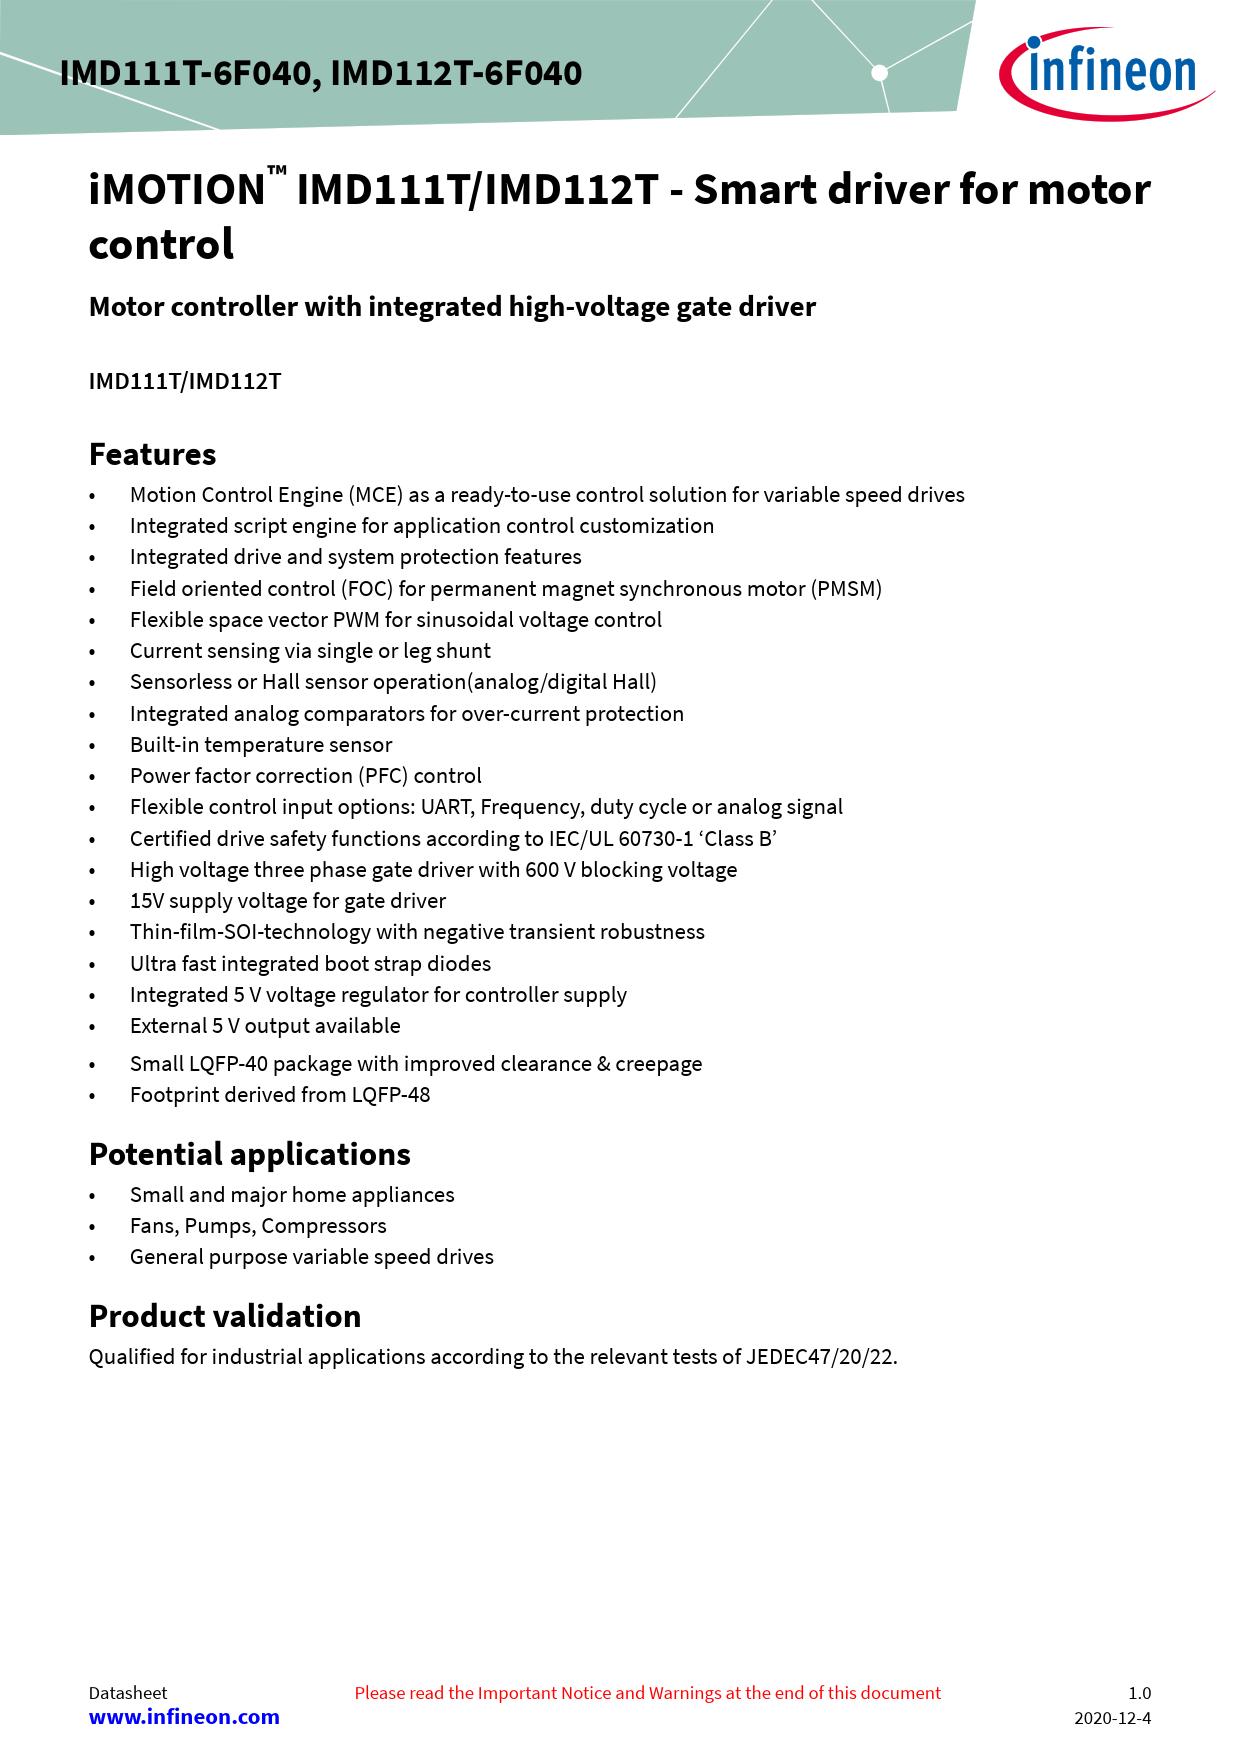 Datasheet IMD112T-6F040 Infineon, 修订版: 01_00